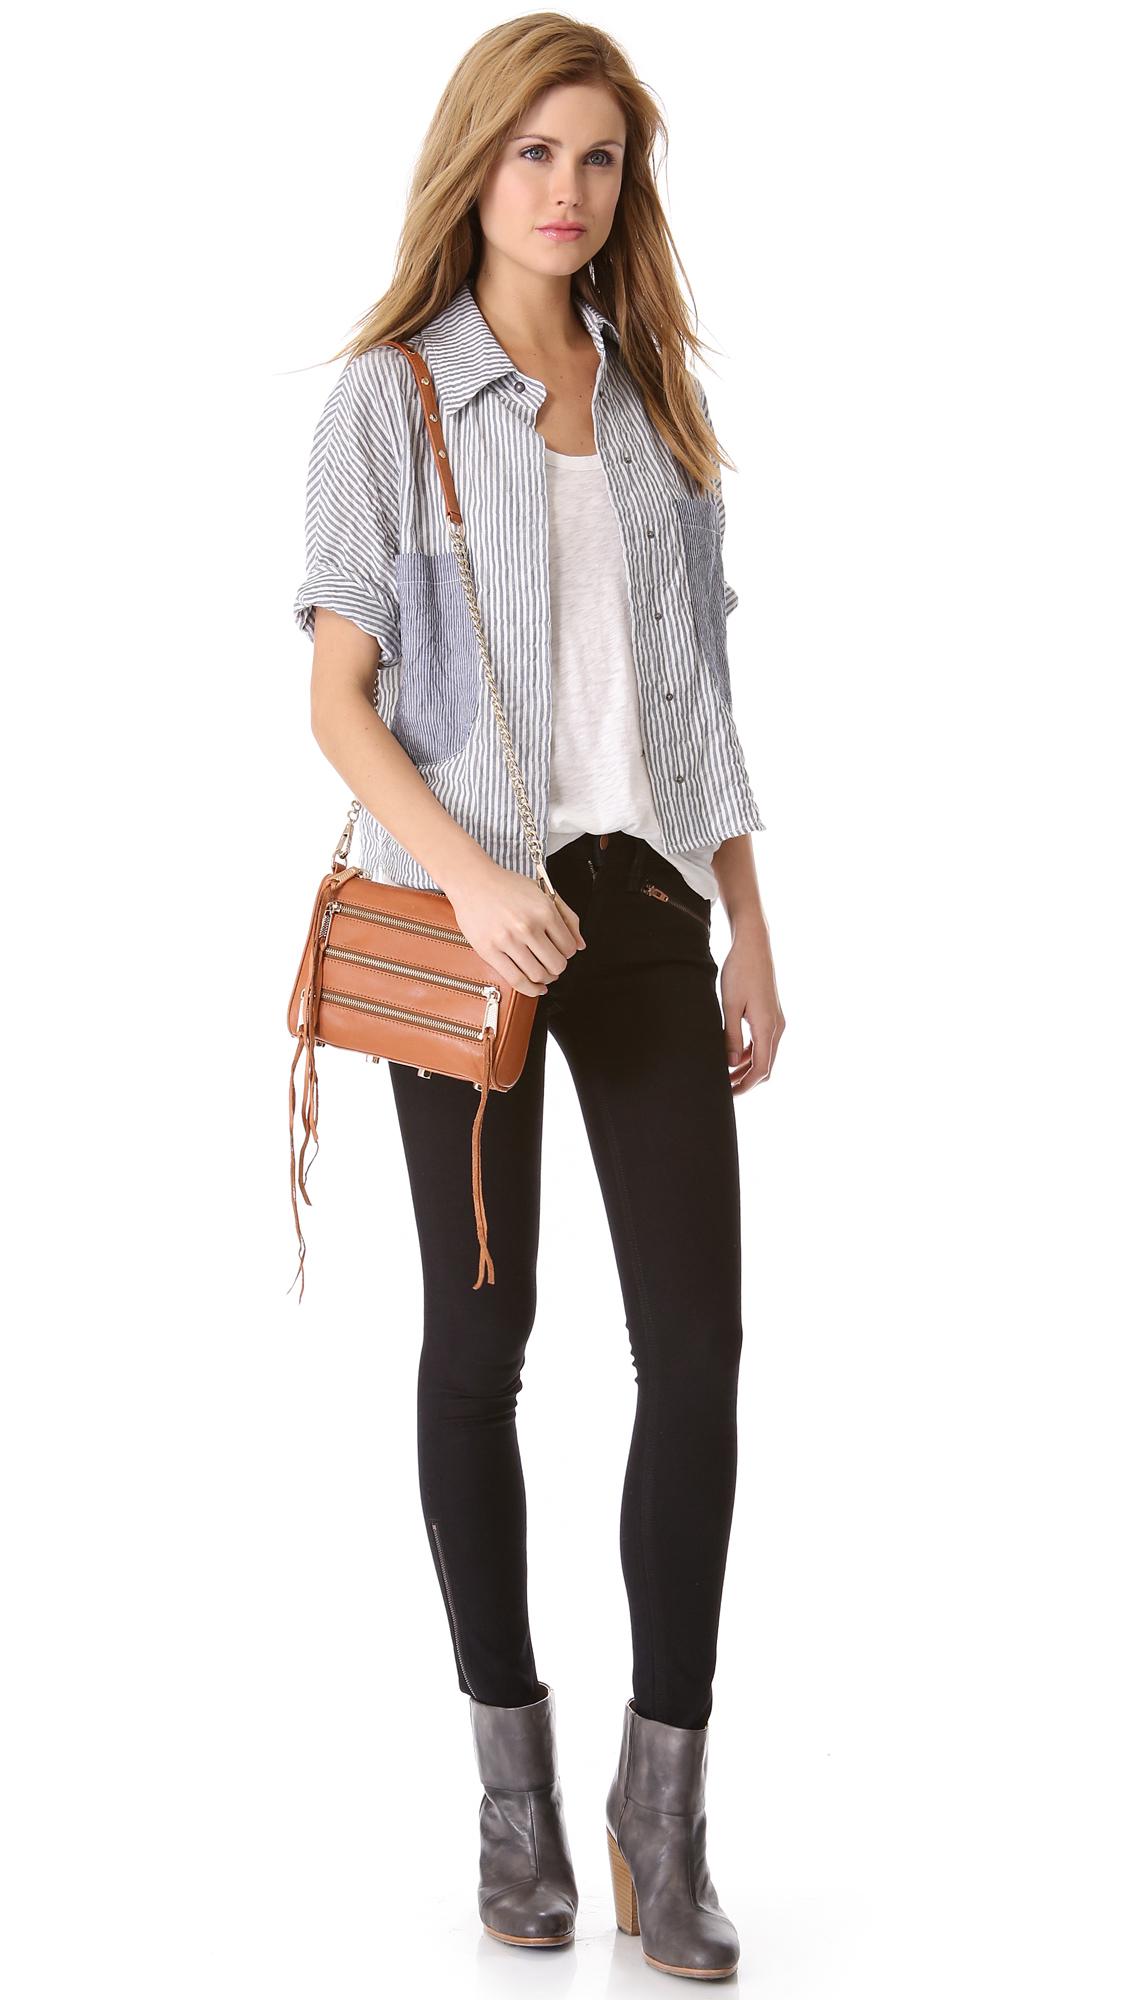 Lyst Rebecca Minkoff Mini 5 Zip Bag In Brown